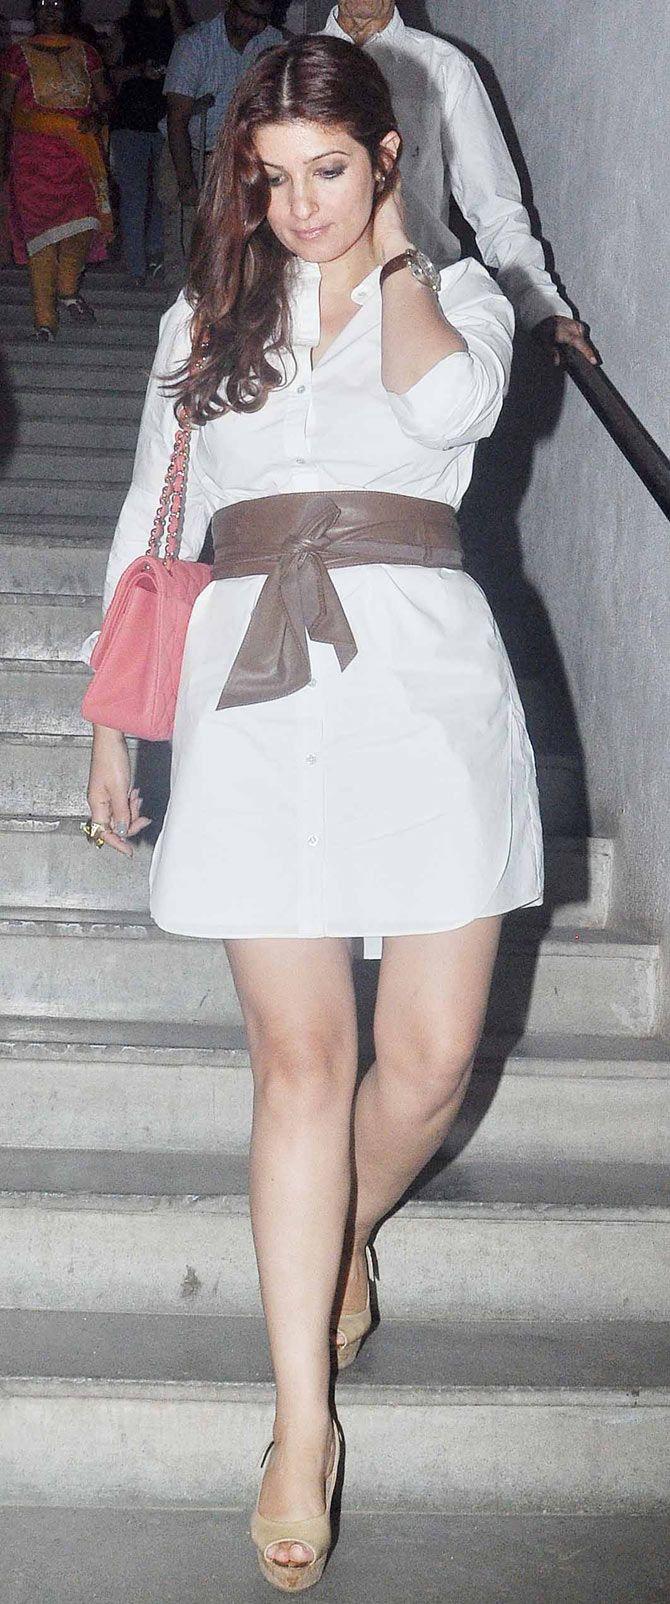 Twinkle Khanna to watch the play 'Mera Woh Matlab Nahi'. #Bollywood #Fashion #Style #Beauty